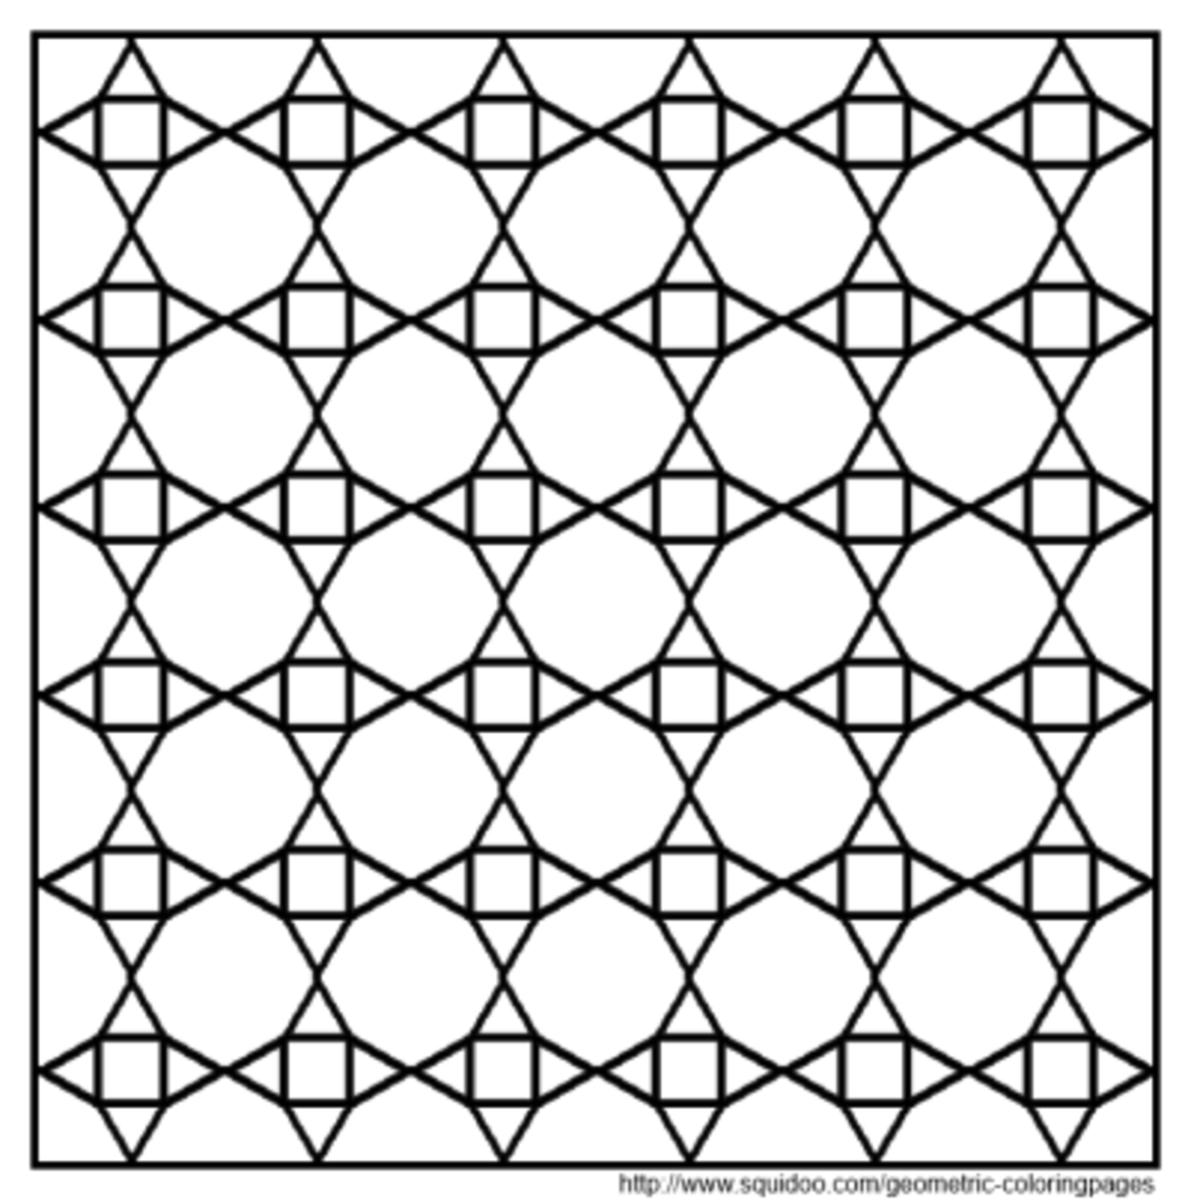 M.c. Escher Coloring Pages Printable Coloring Pages